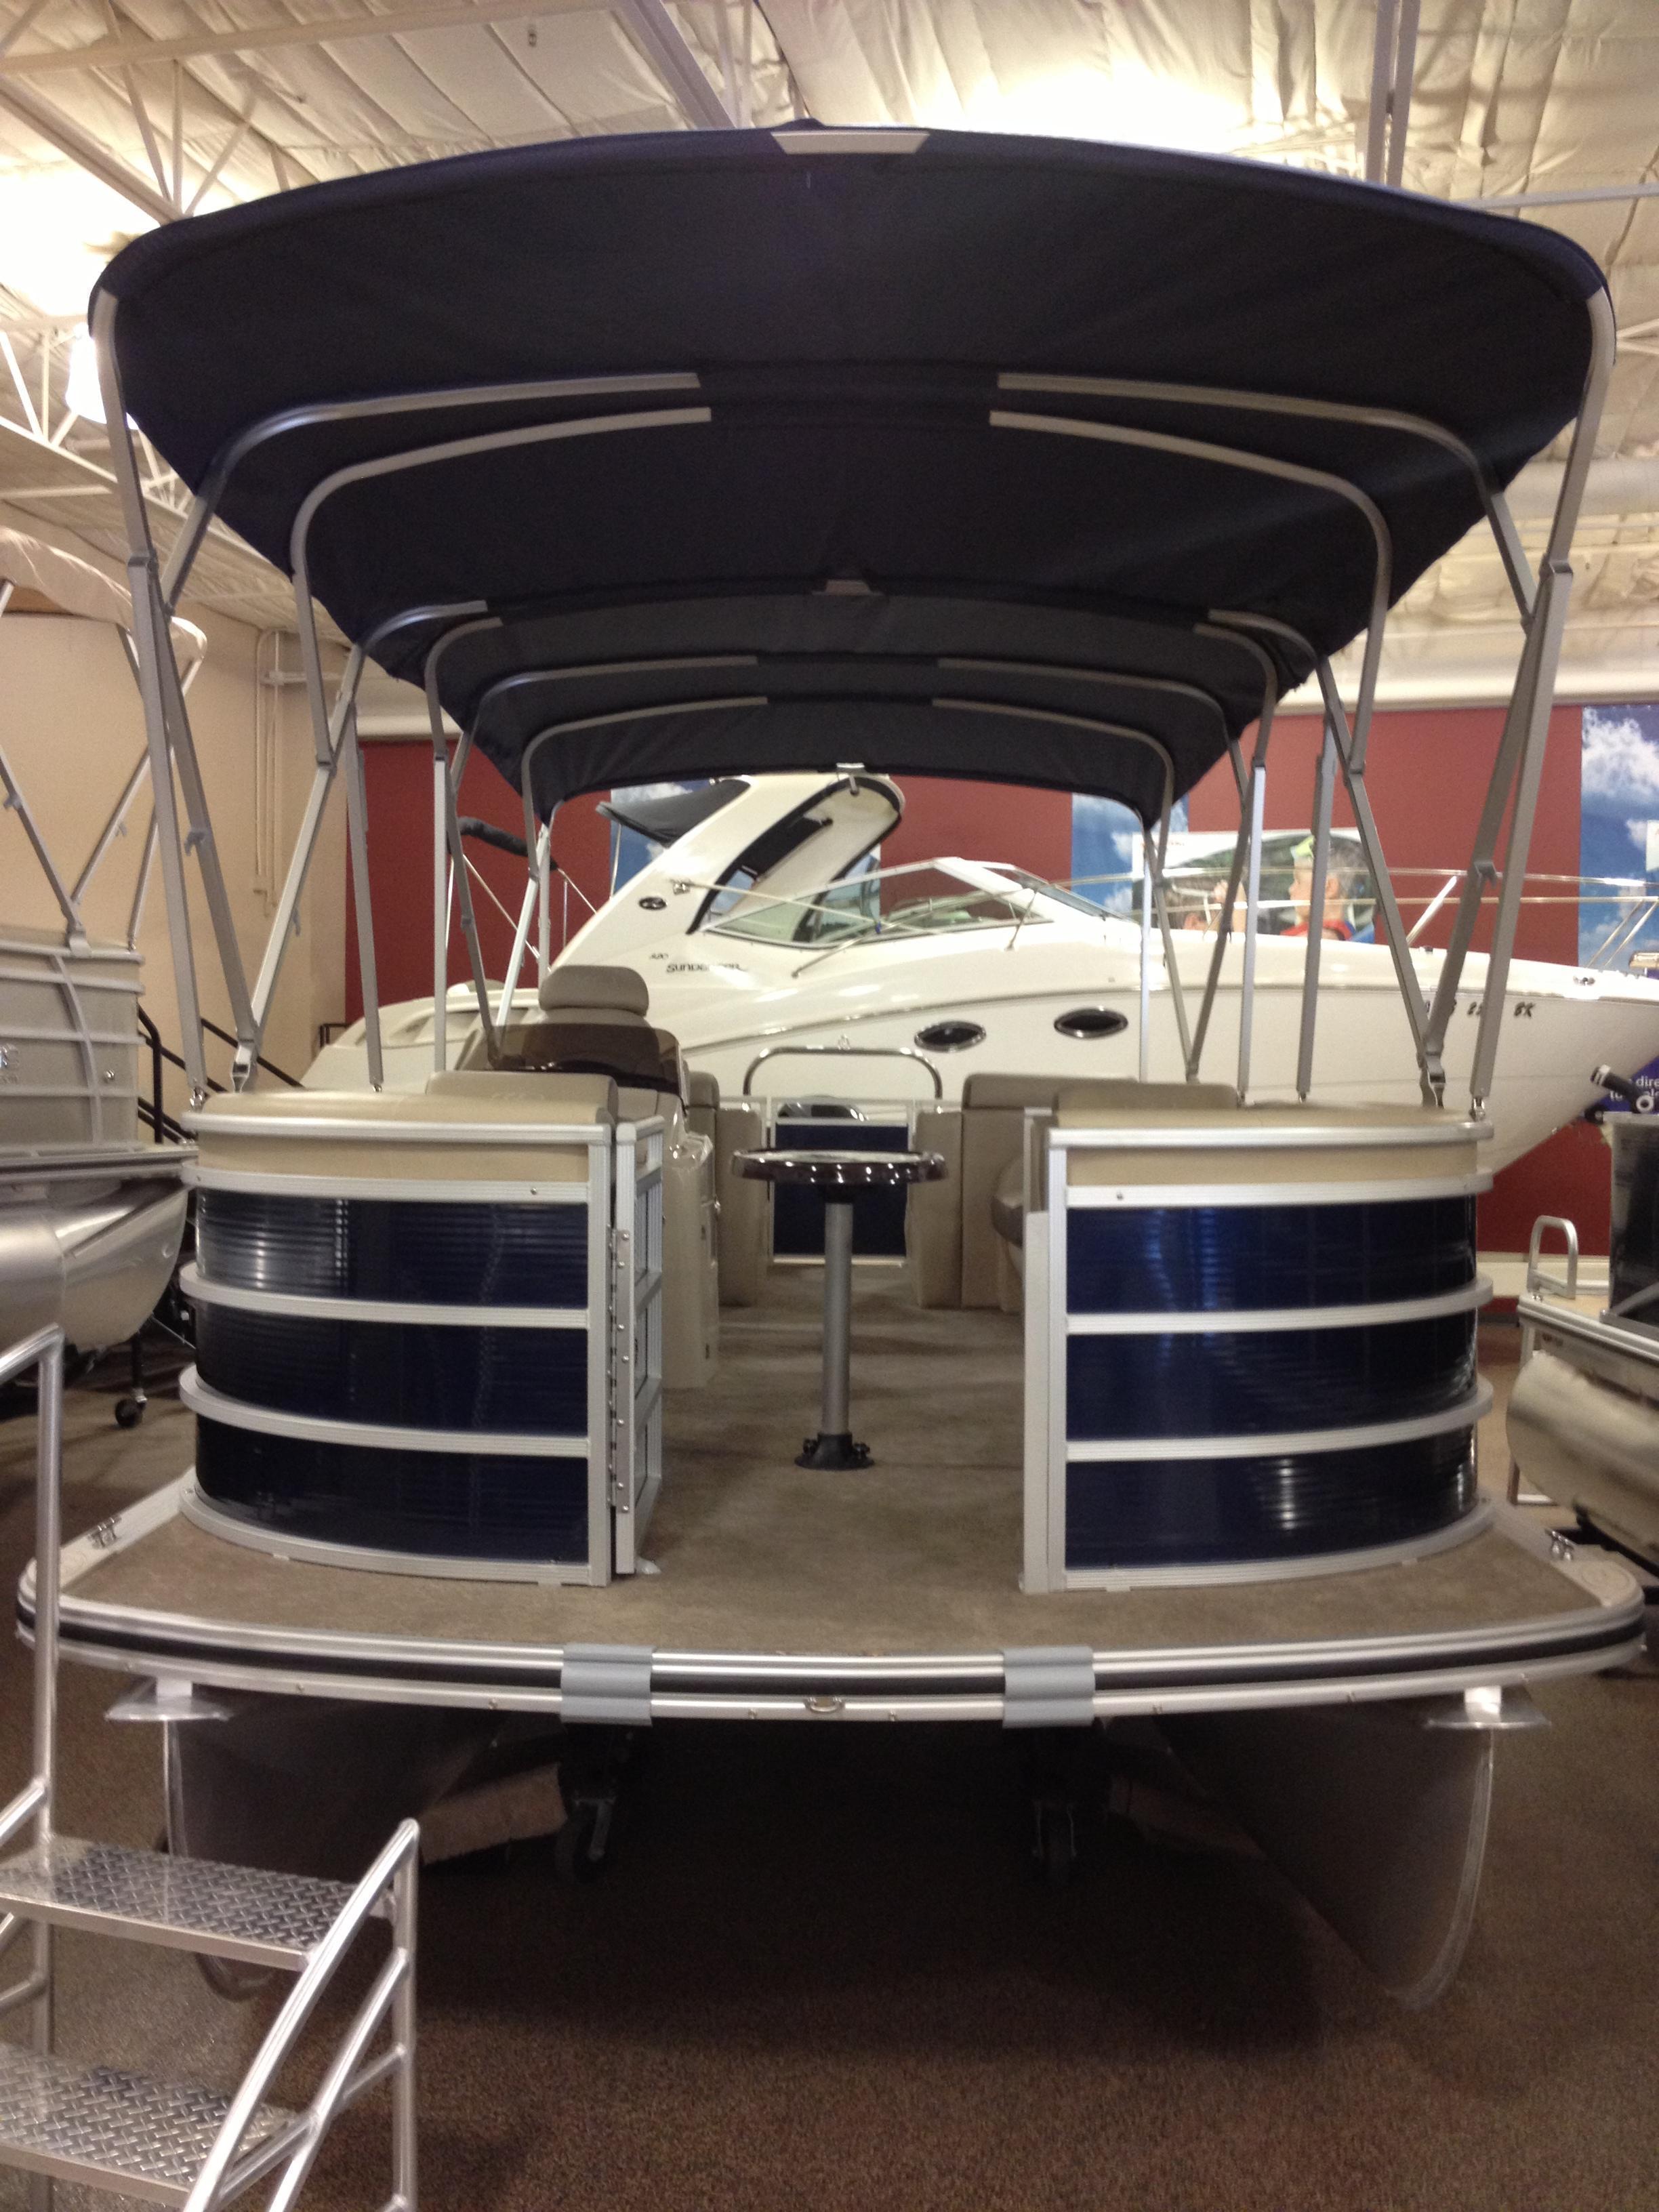 Harris FloteBote Sunliner 220, Tempe